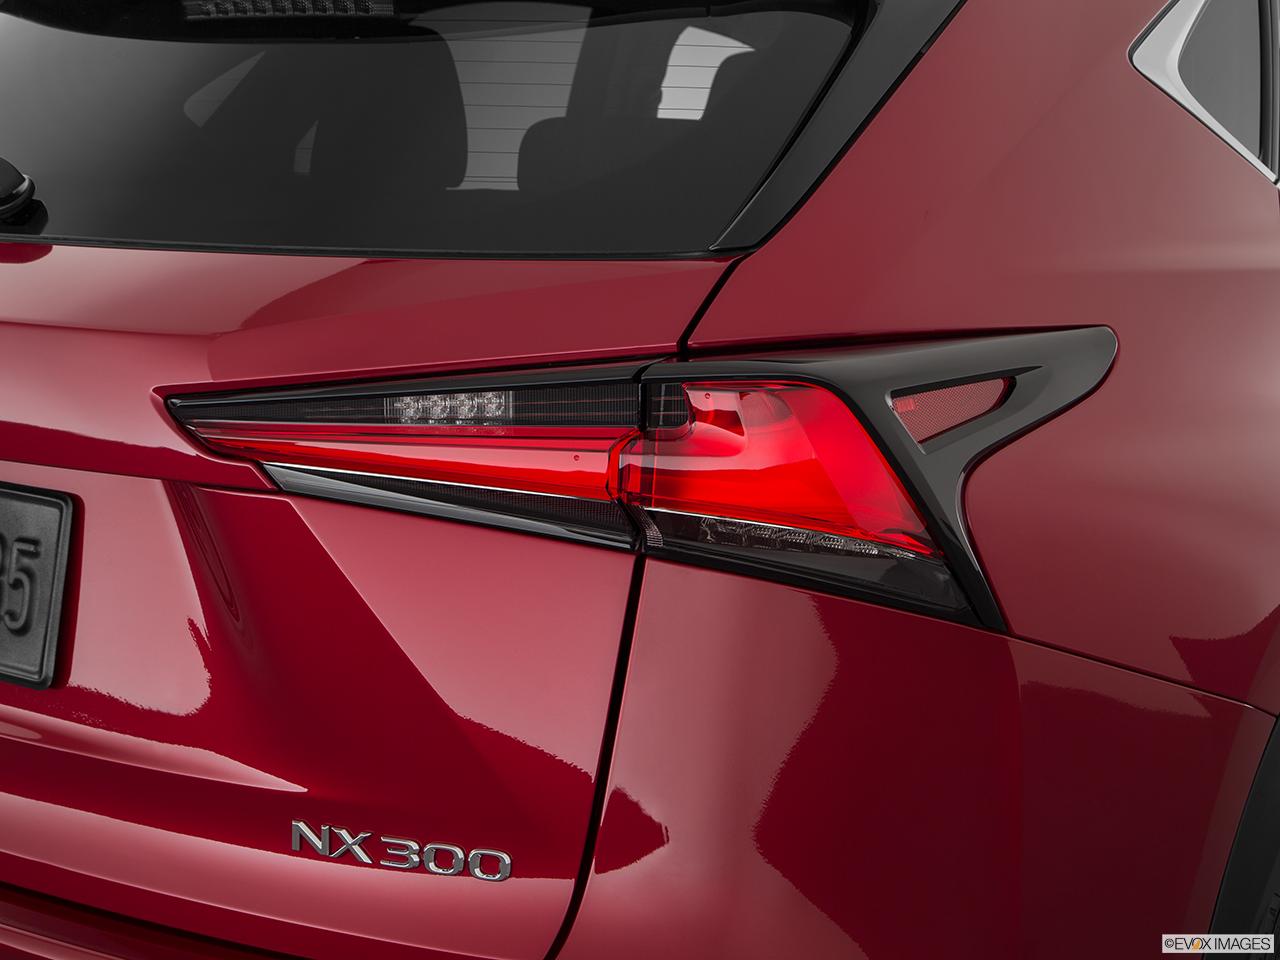 2020 Lexus NX 300 photo